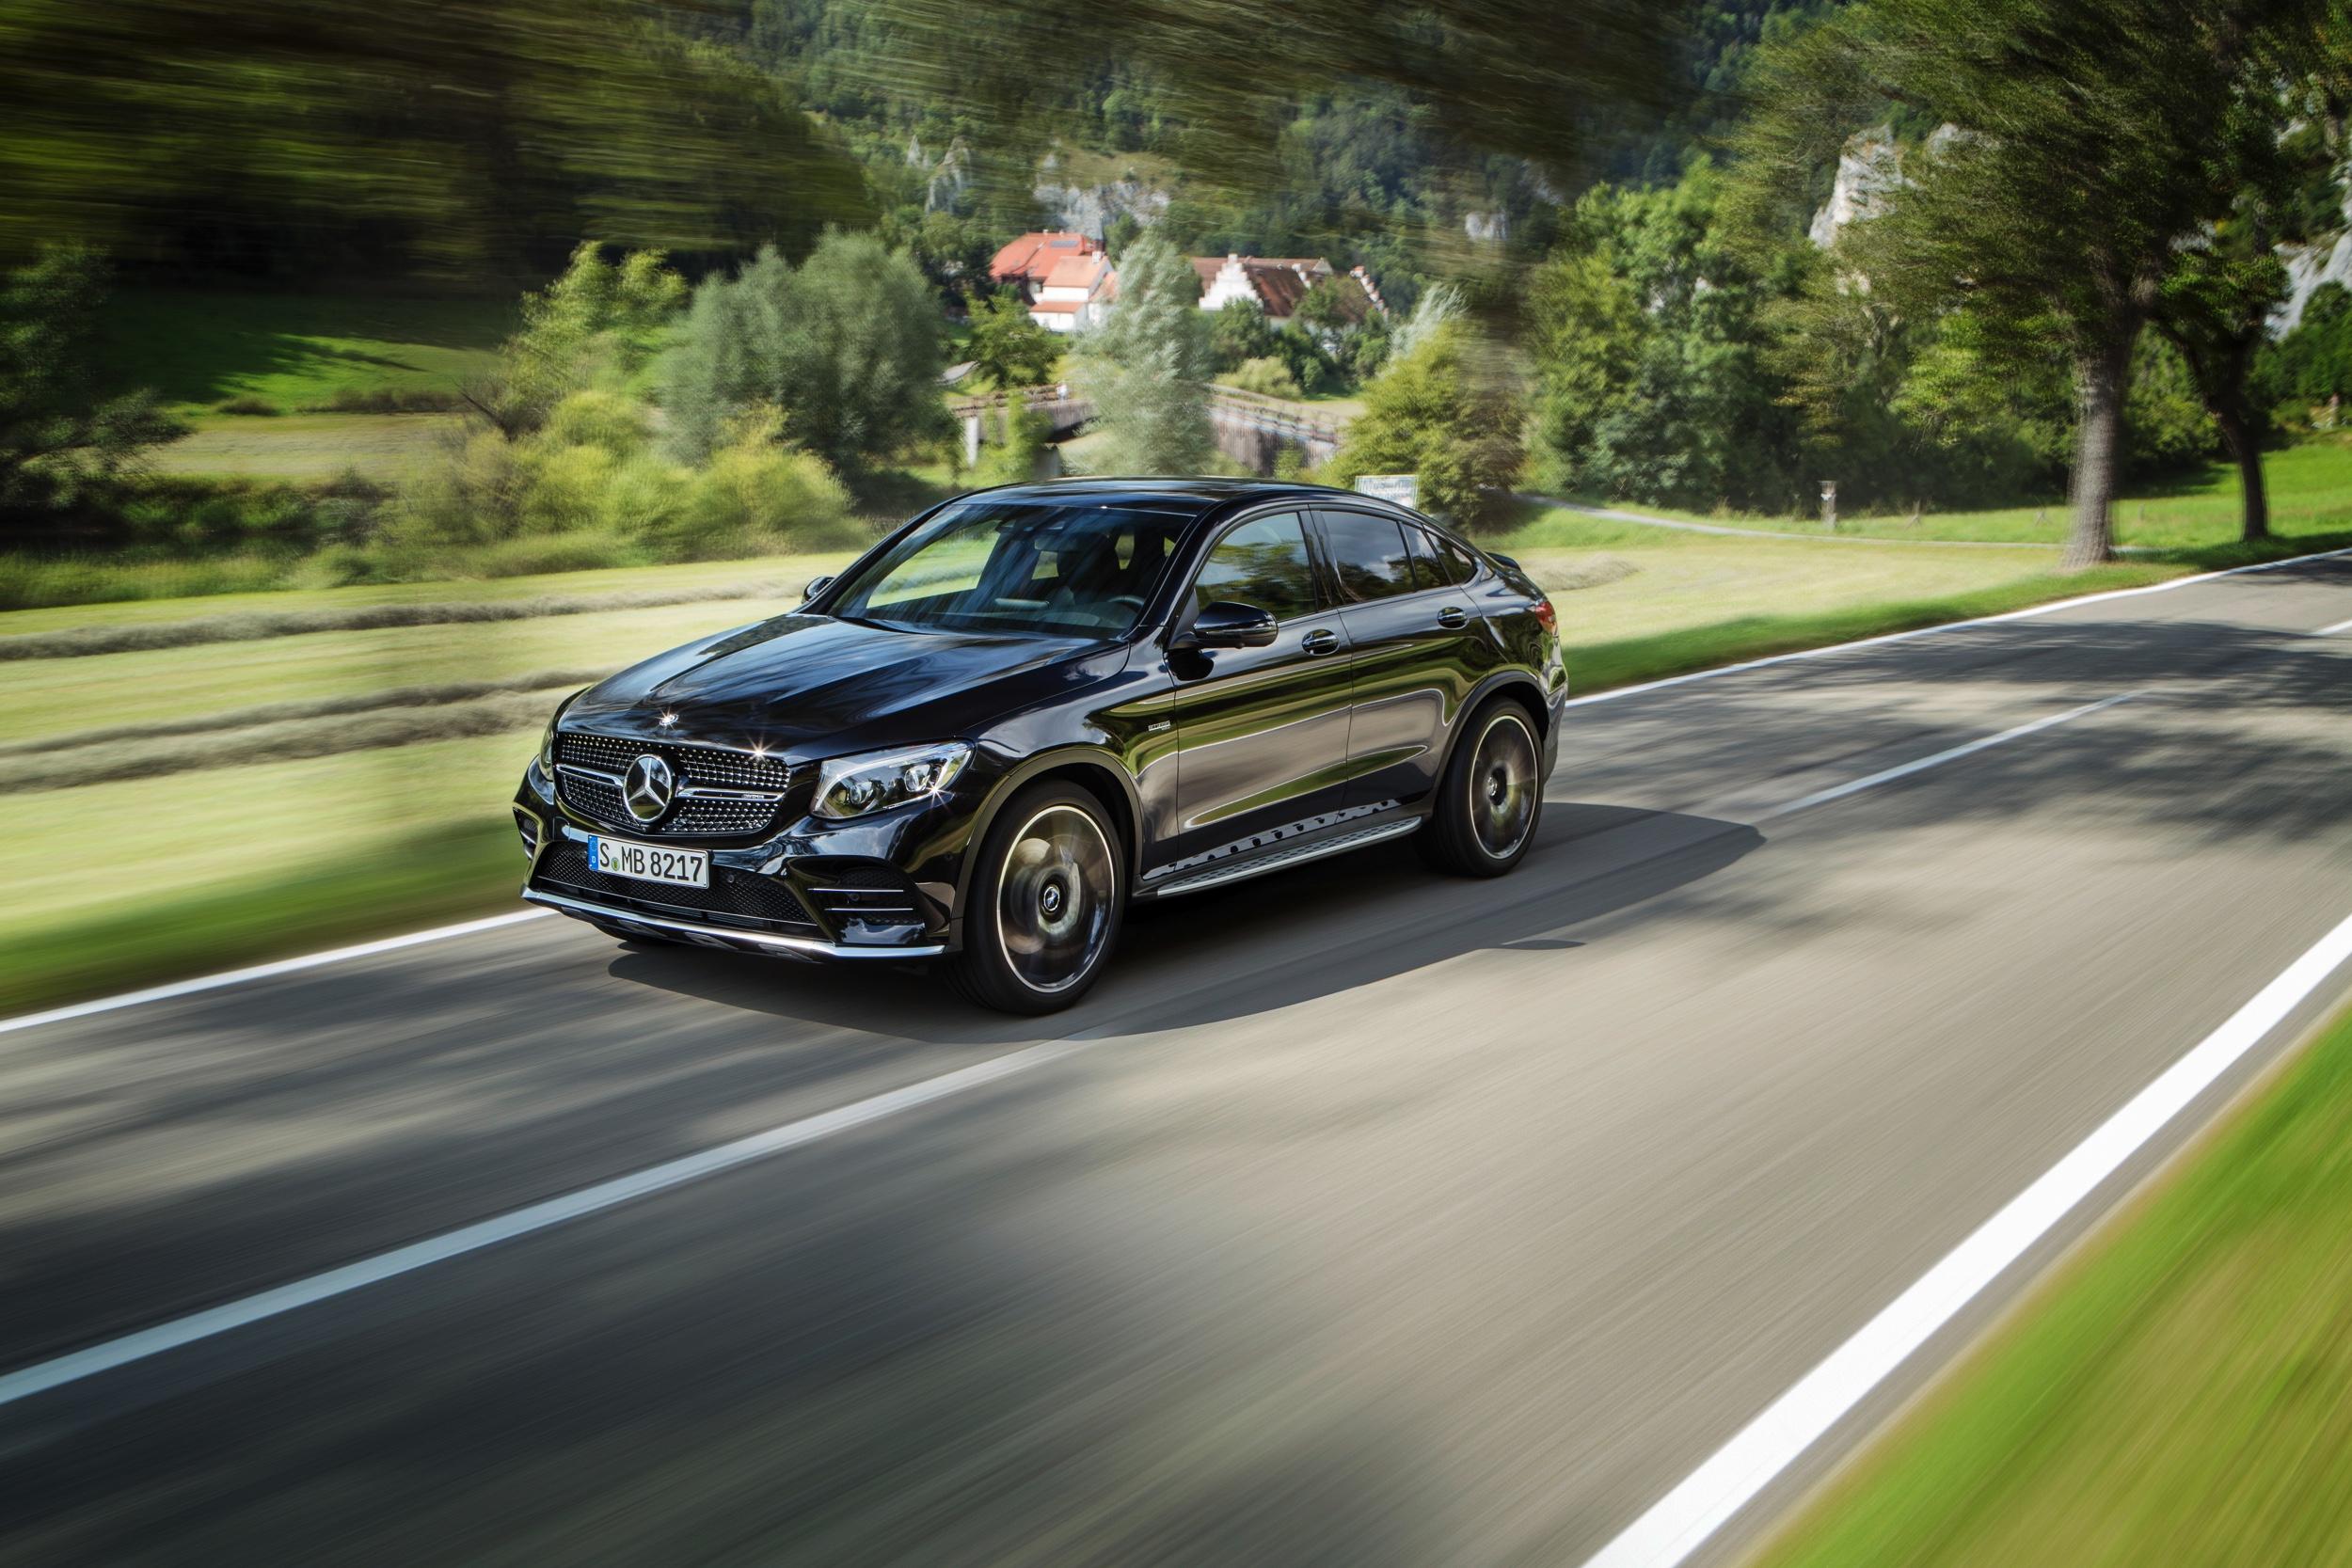 Mercedes-AMG GLC 43 Coupe -7- Autovisie.nl